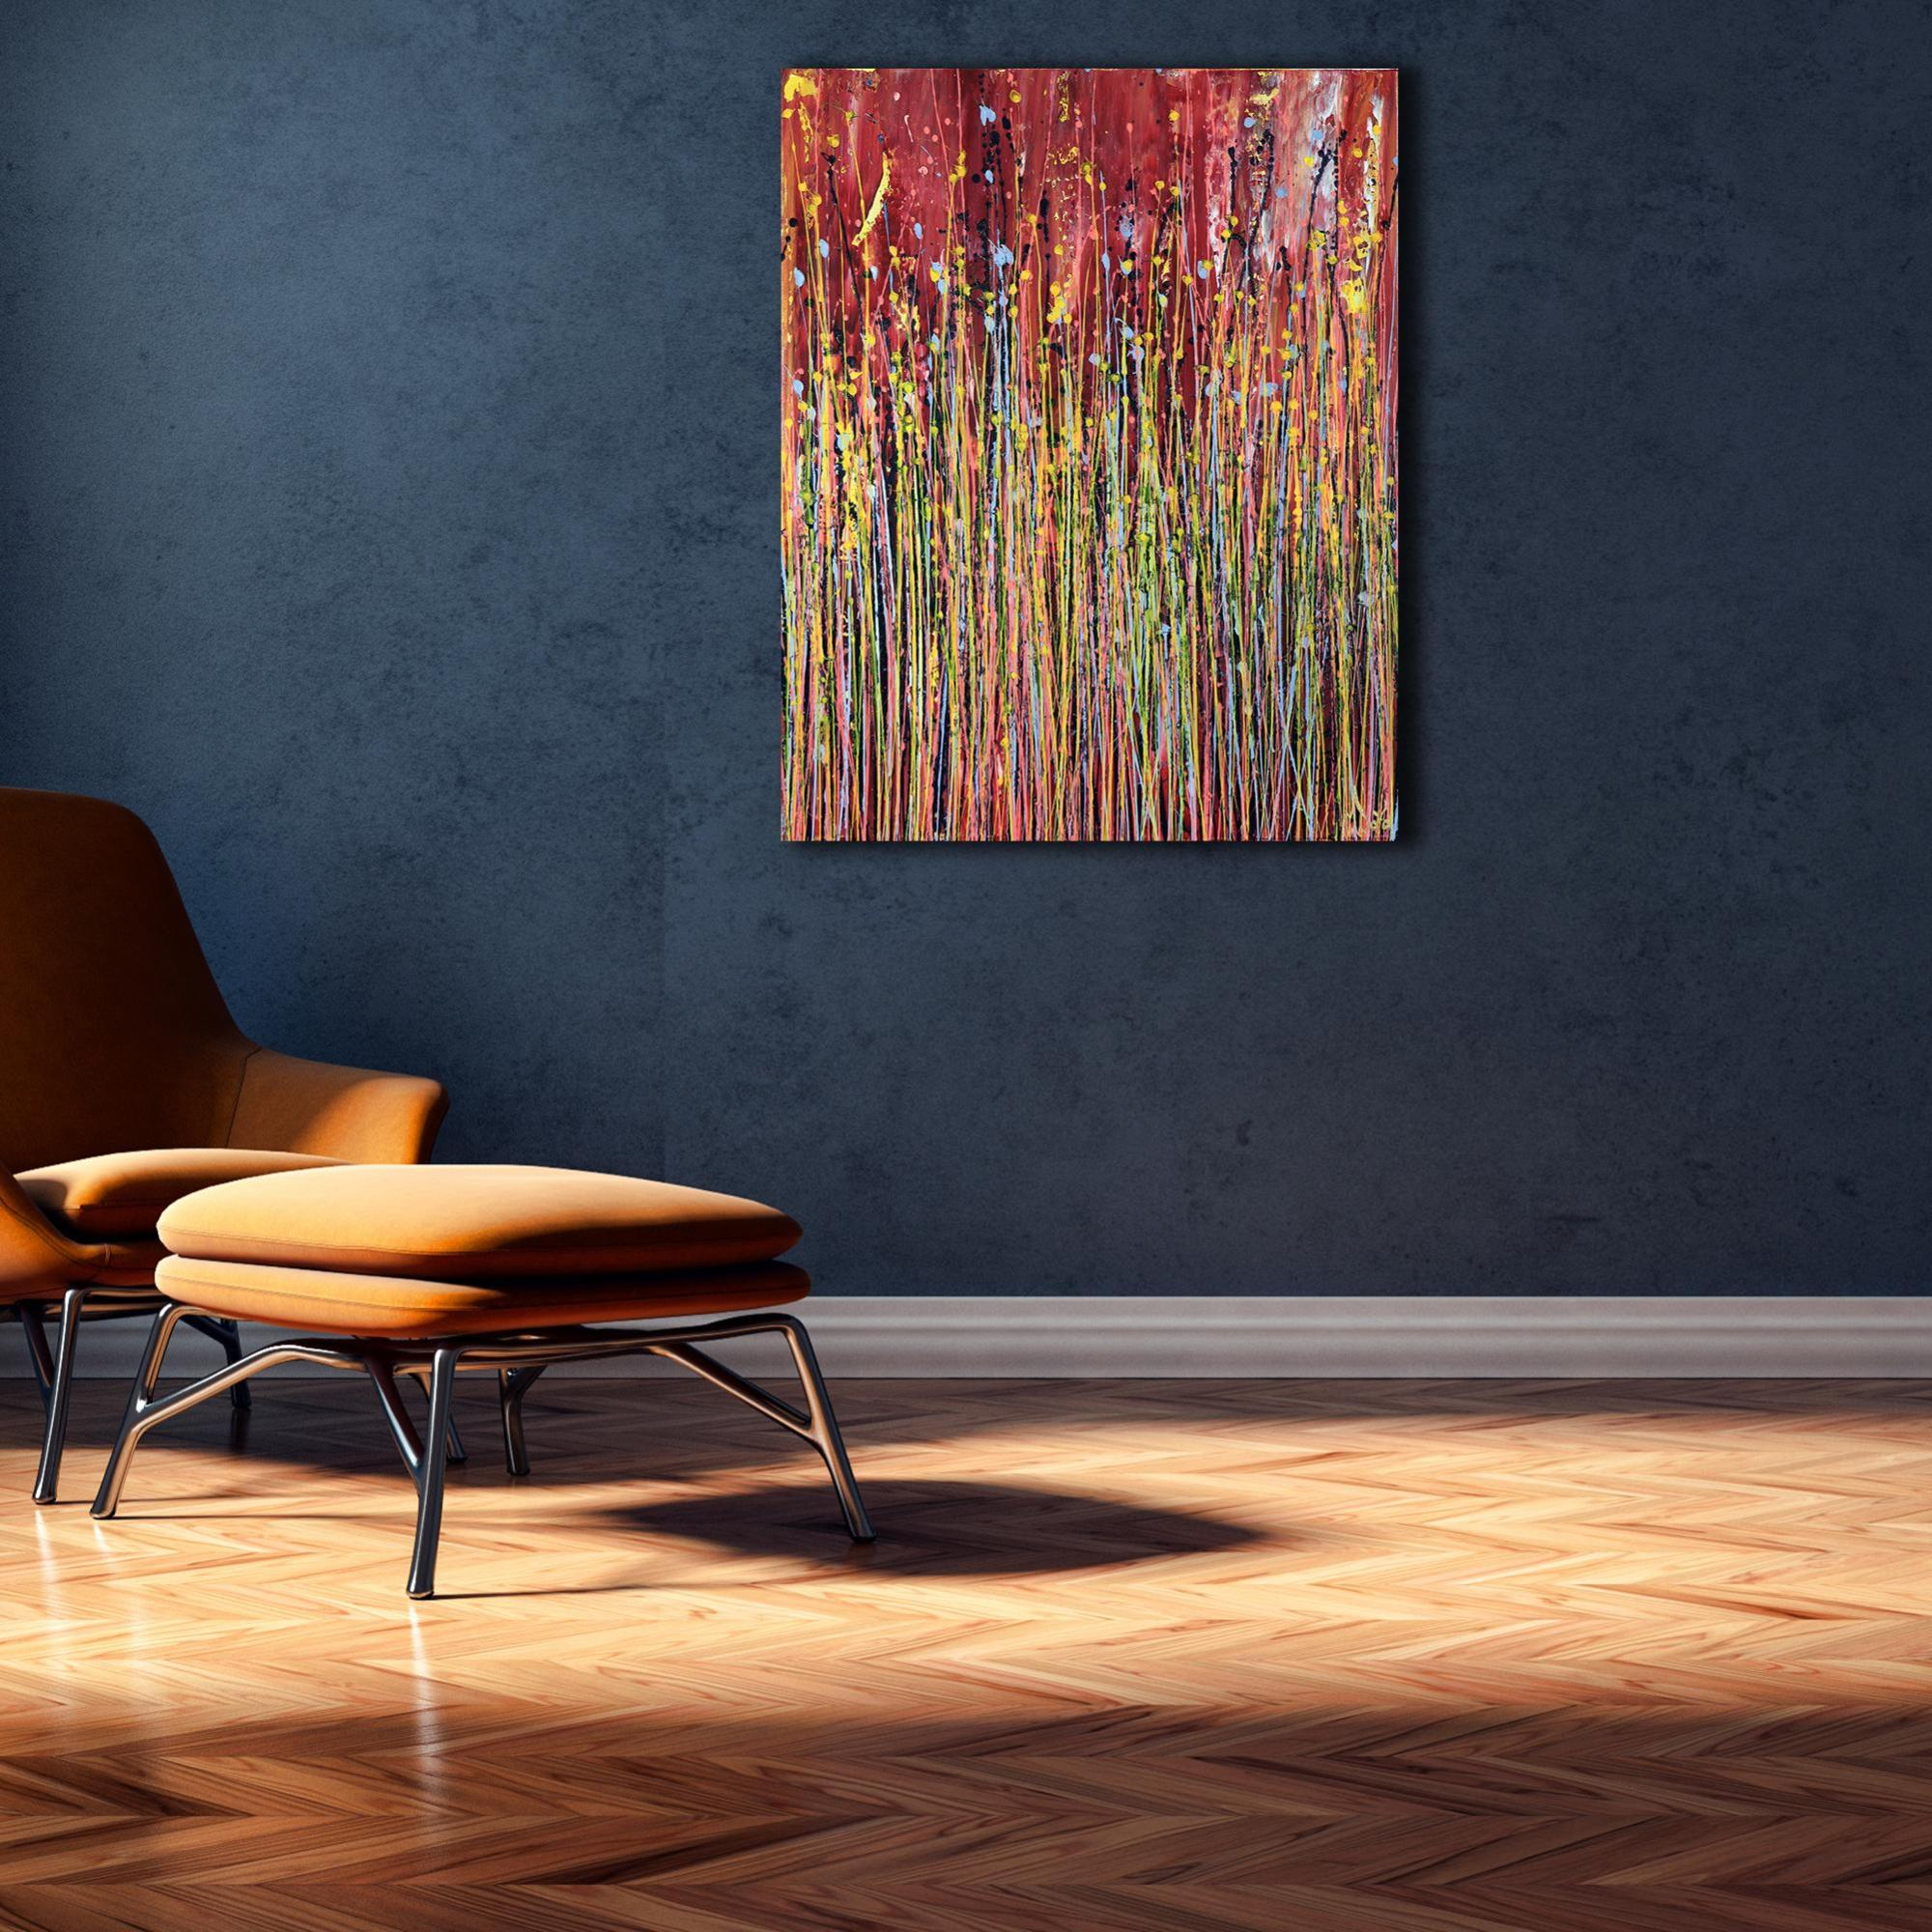 Faces Of Nature 2 (2021) / Room view / Artist: Nestor Toro